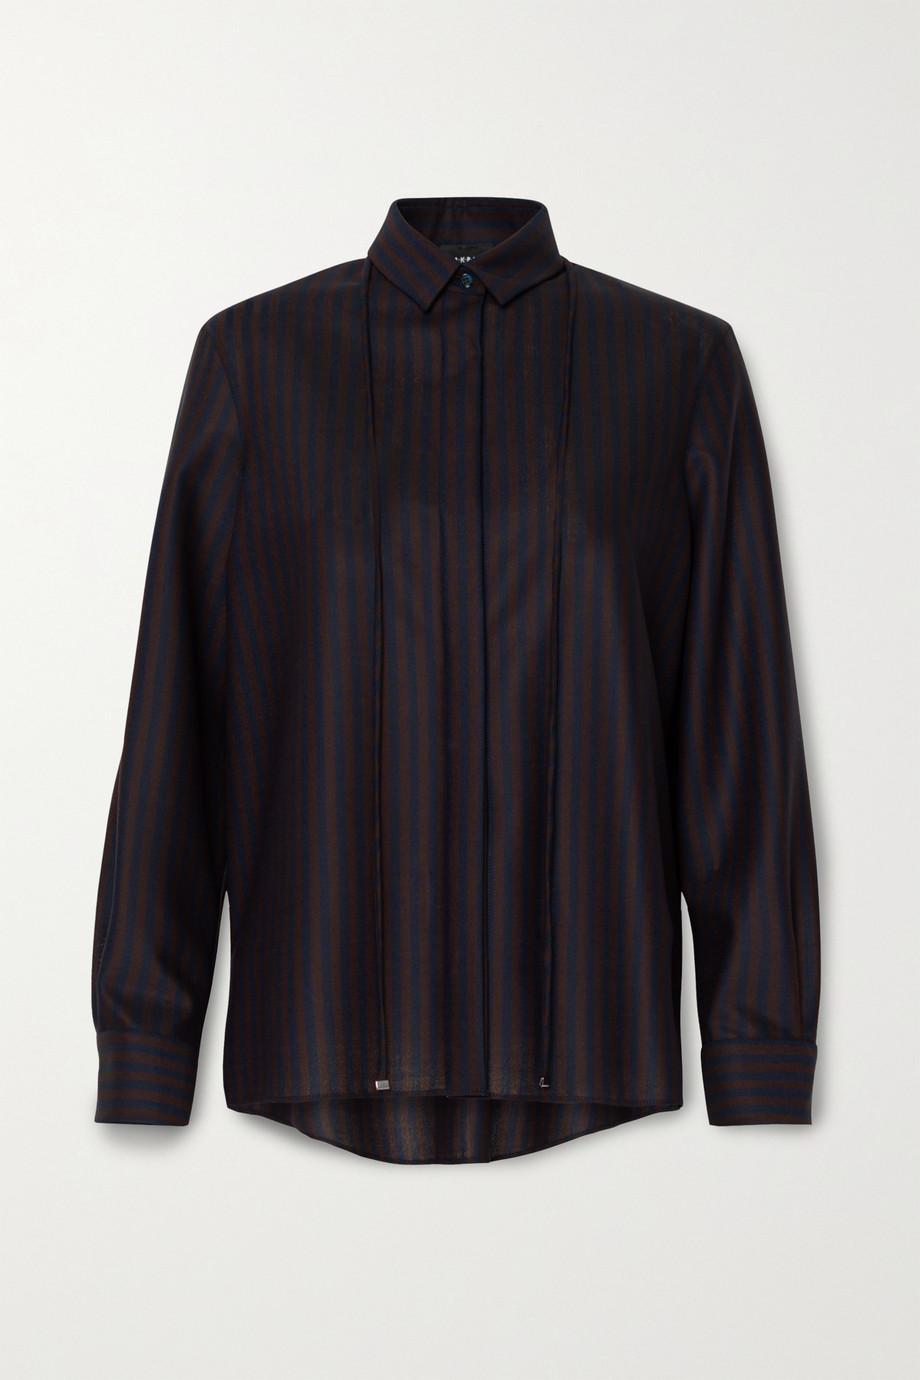 Akris Striped stretch-wool shirt